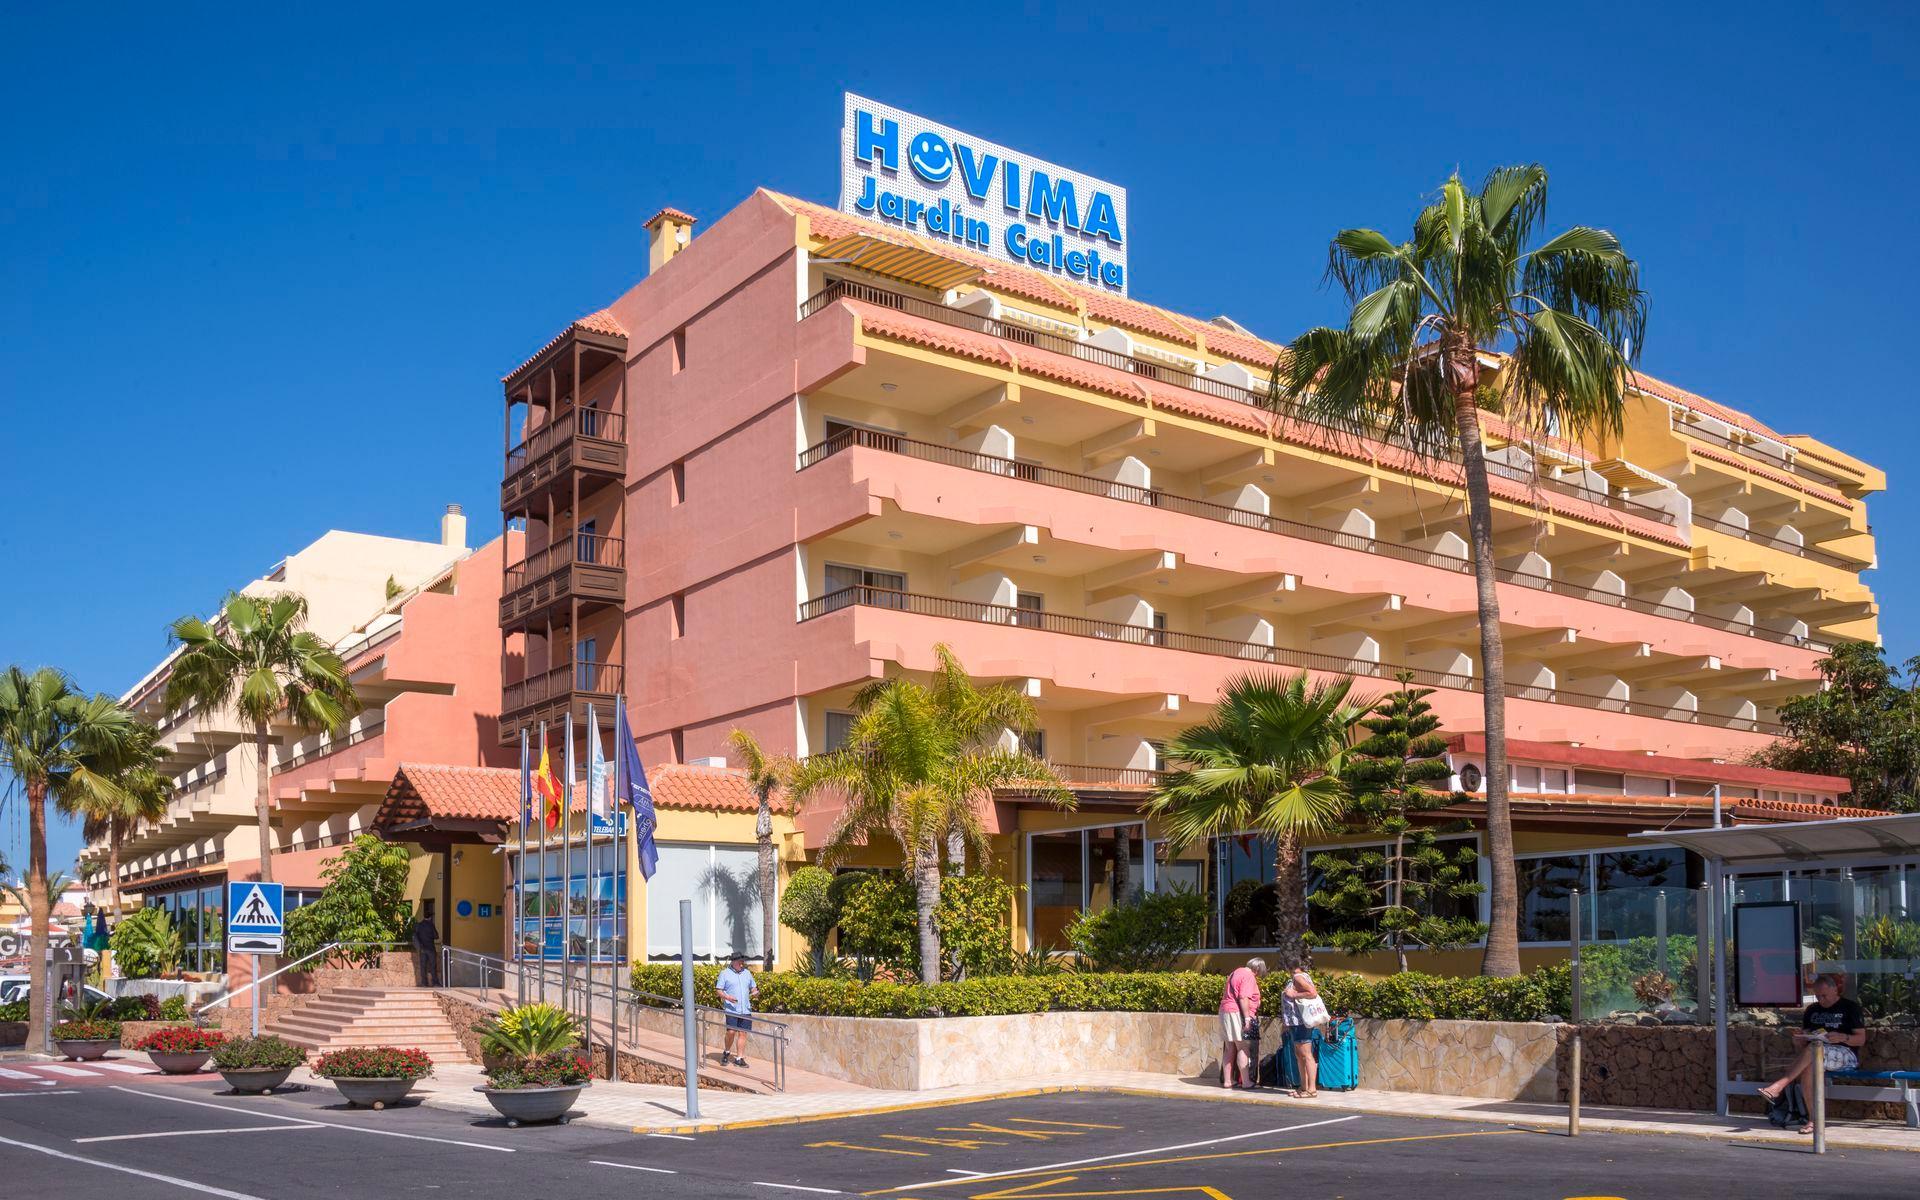 Hoteles cerca de golf costa adeje en tenerife for Apartamentos hovima jardin caleta